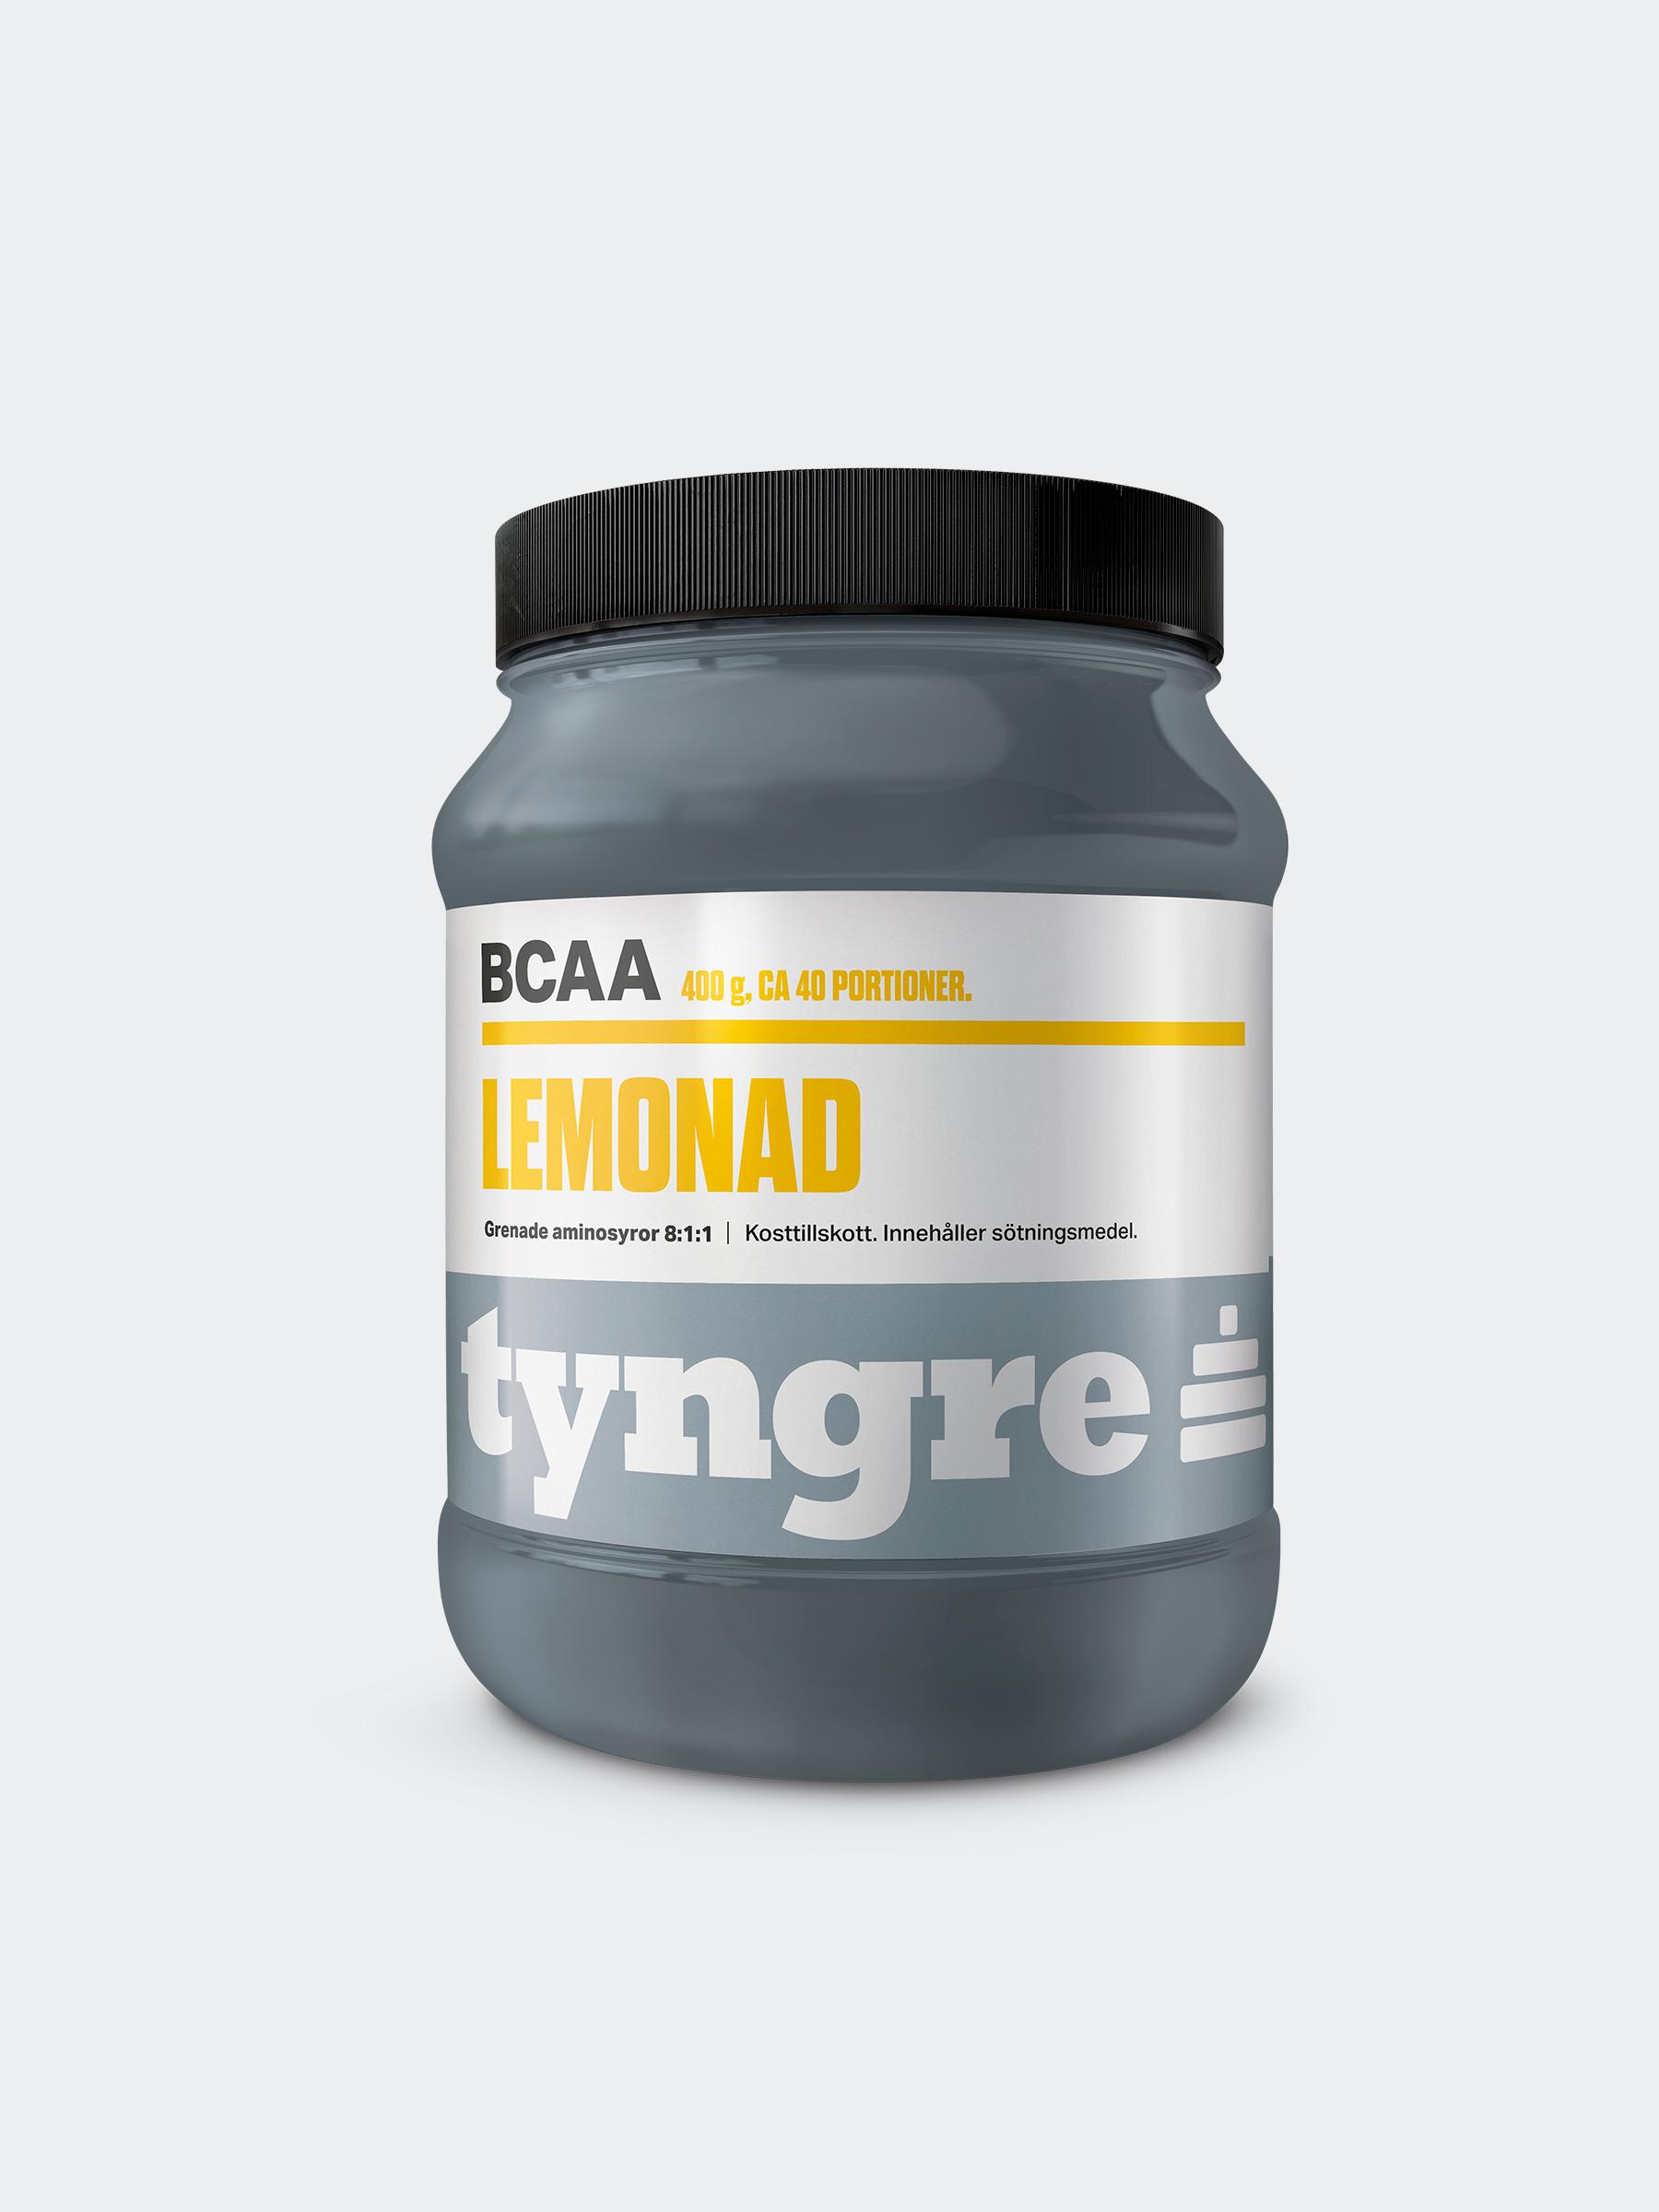 BCAA Lemonad